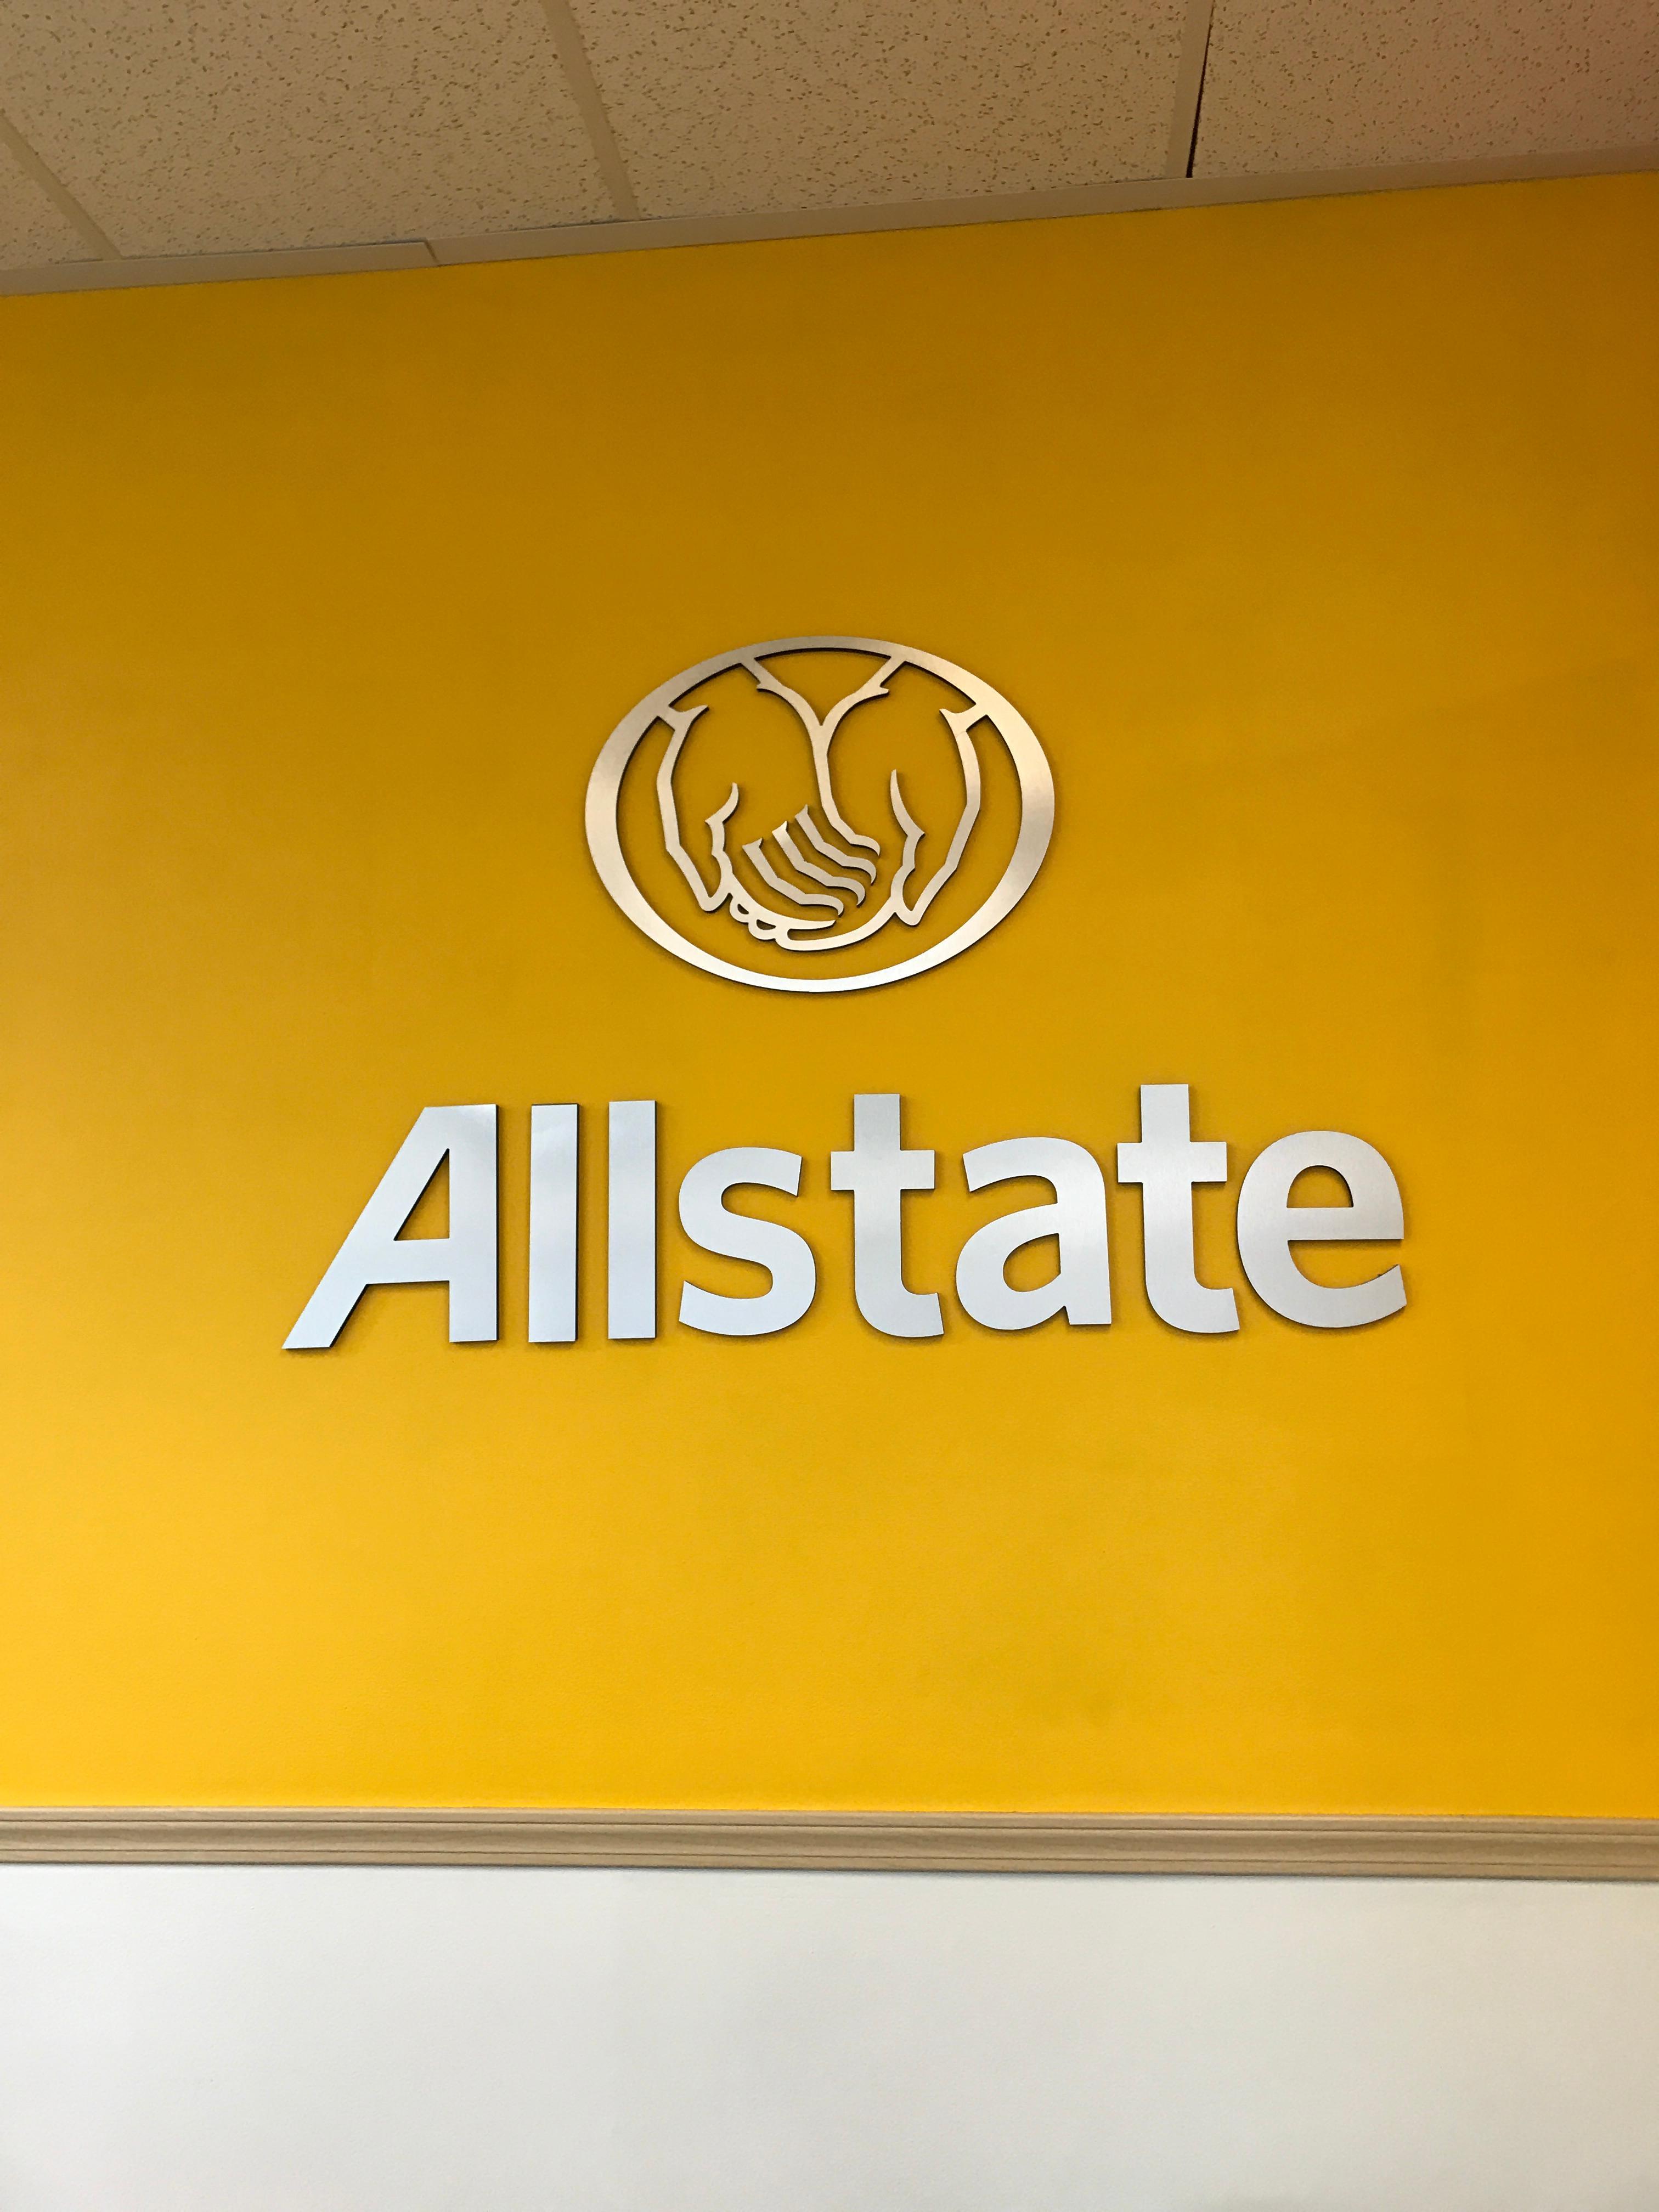 Allstate Quotes For Car Insurance >> Janelle Suson: Allstate Insurance, Seattle Washington (WA) - LocalDatabase.com